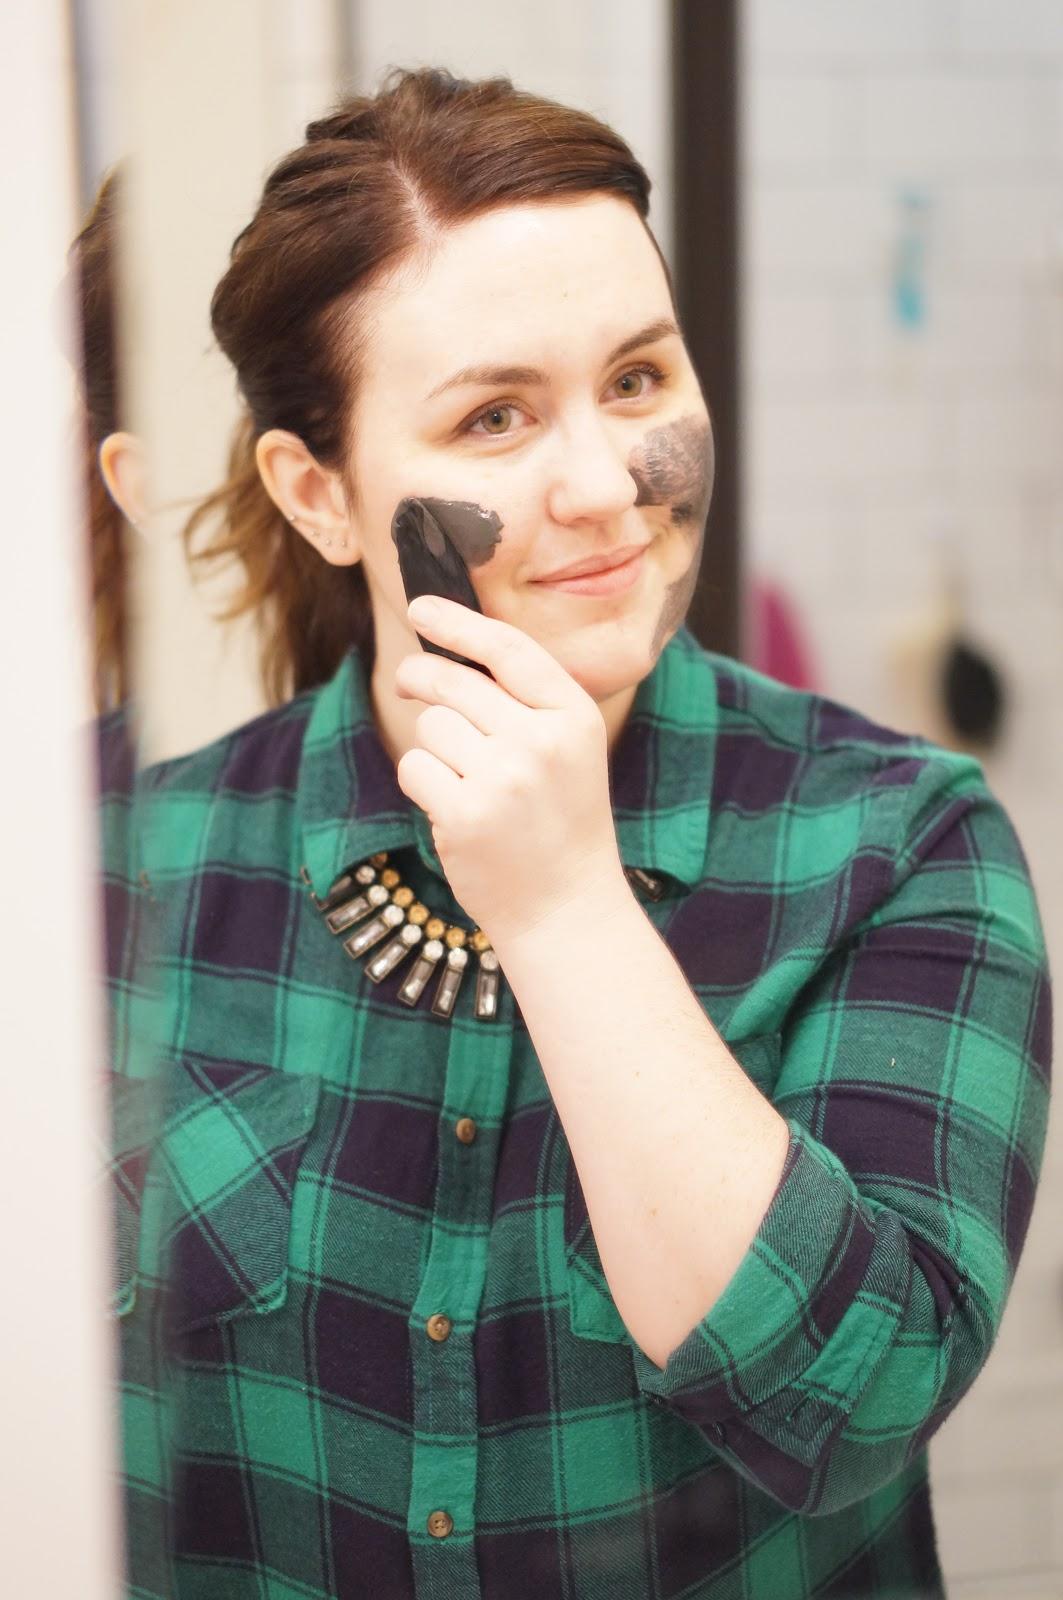 ONYX YOUTH MAGNET MASK by North Carolina beauty blogger Rebecca Lately